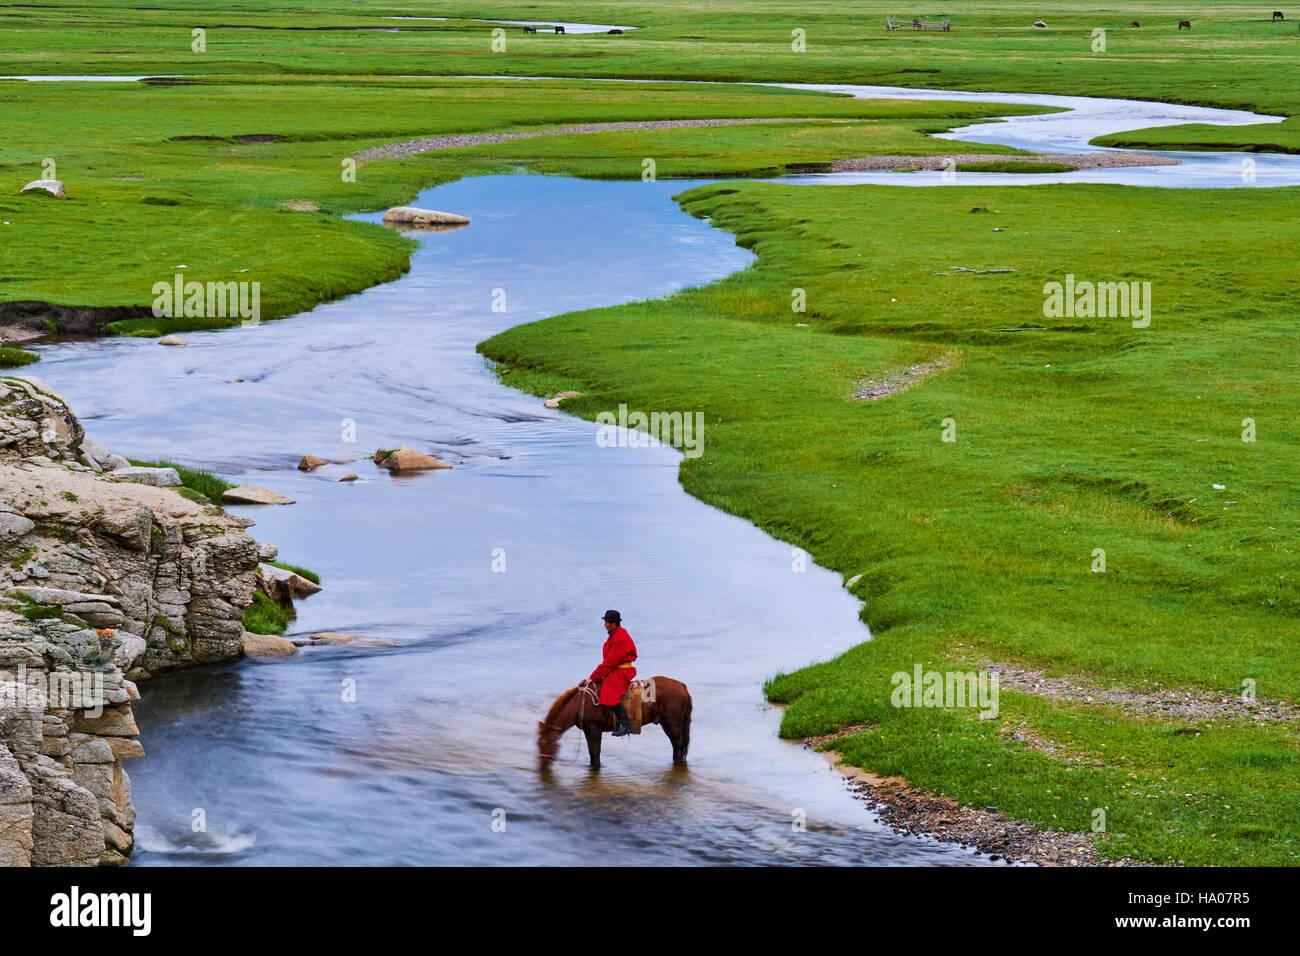 Mongolia, Arkhangai province, Mongolian horserider in the steppe - Stock Image